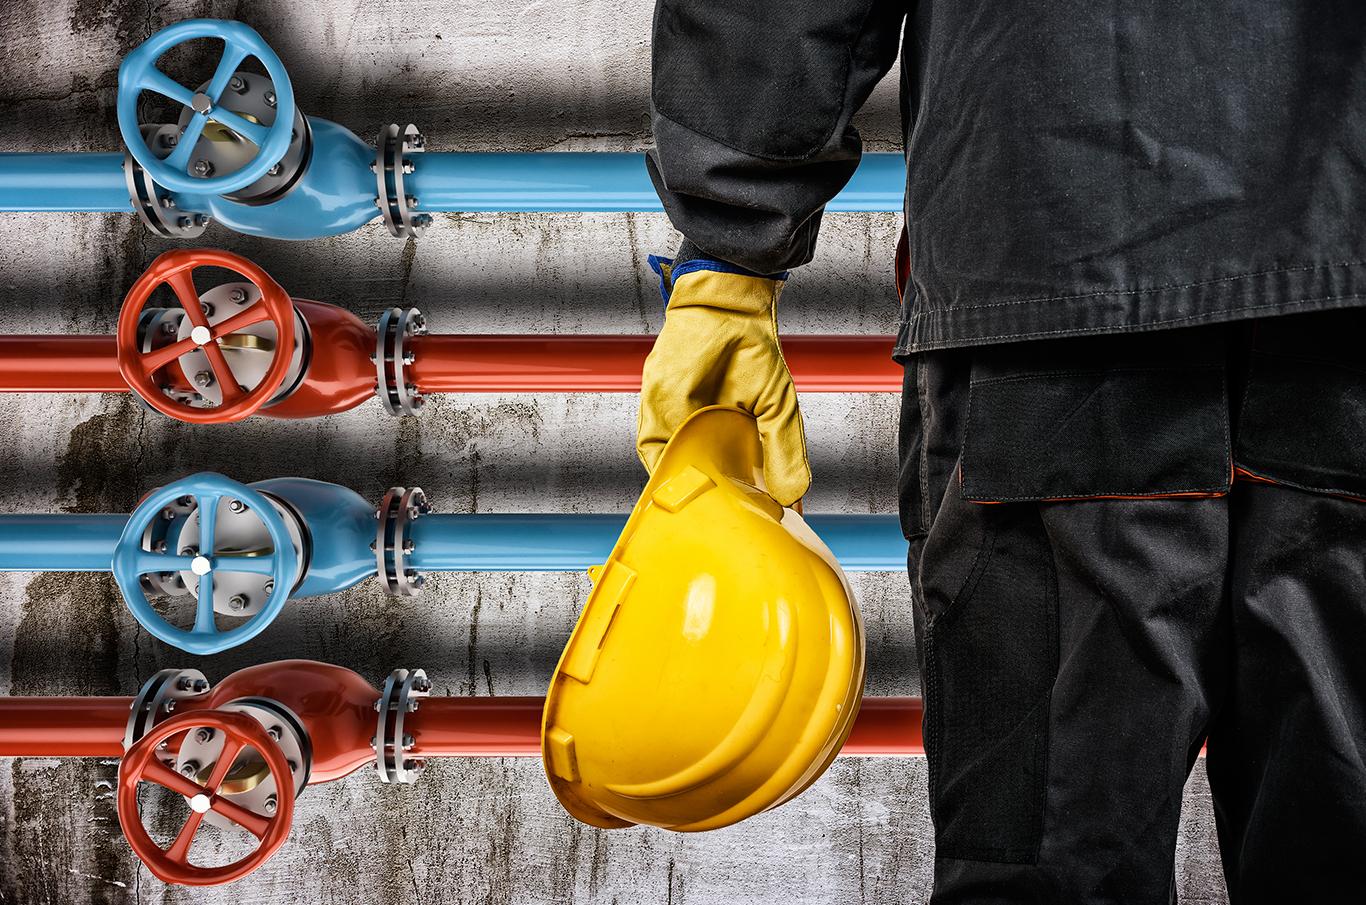 safety standards, labour safety welfare, ความปลอดภัย, ความปลอดภัยแรงงาน